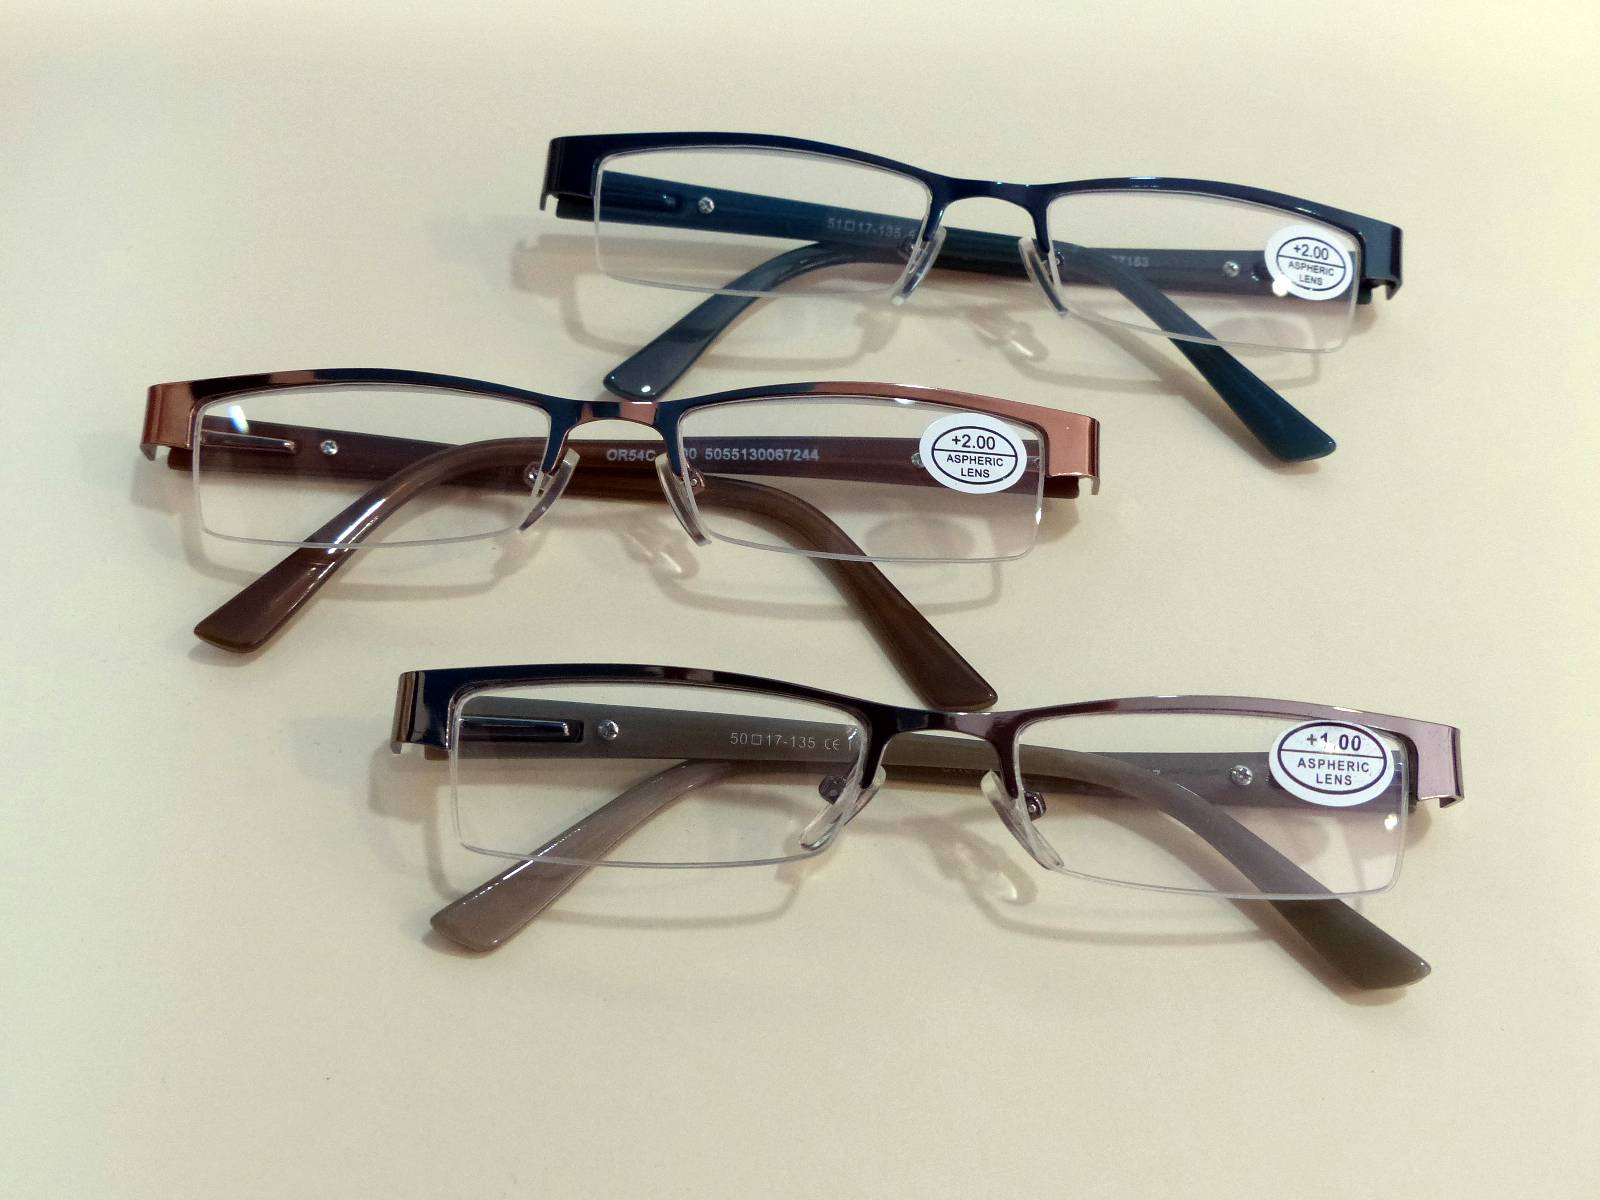 b589fb676a Gafa Presbicia Montana Eyewear - LensForVision - Comprar Lupas ...